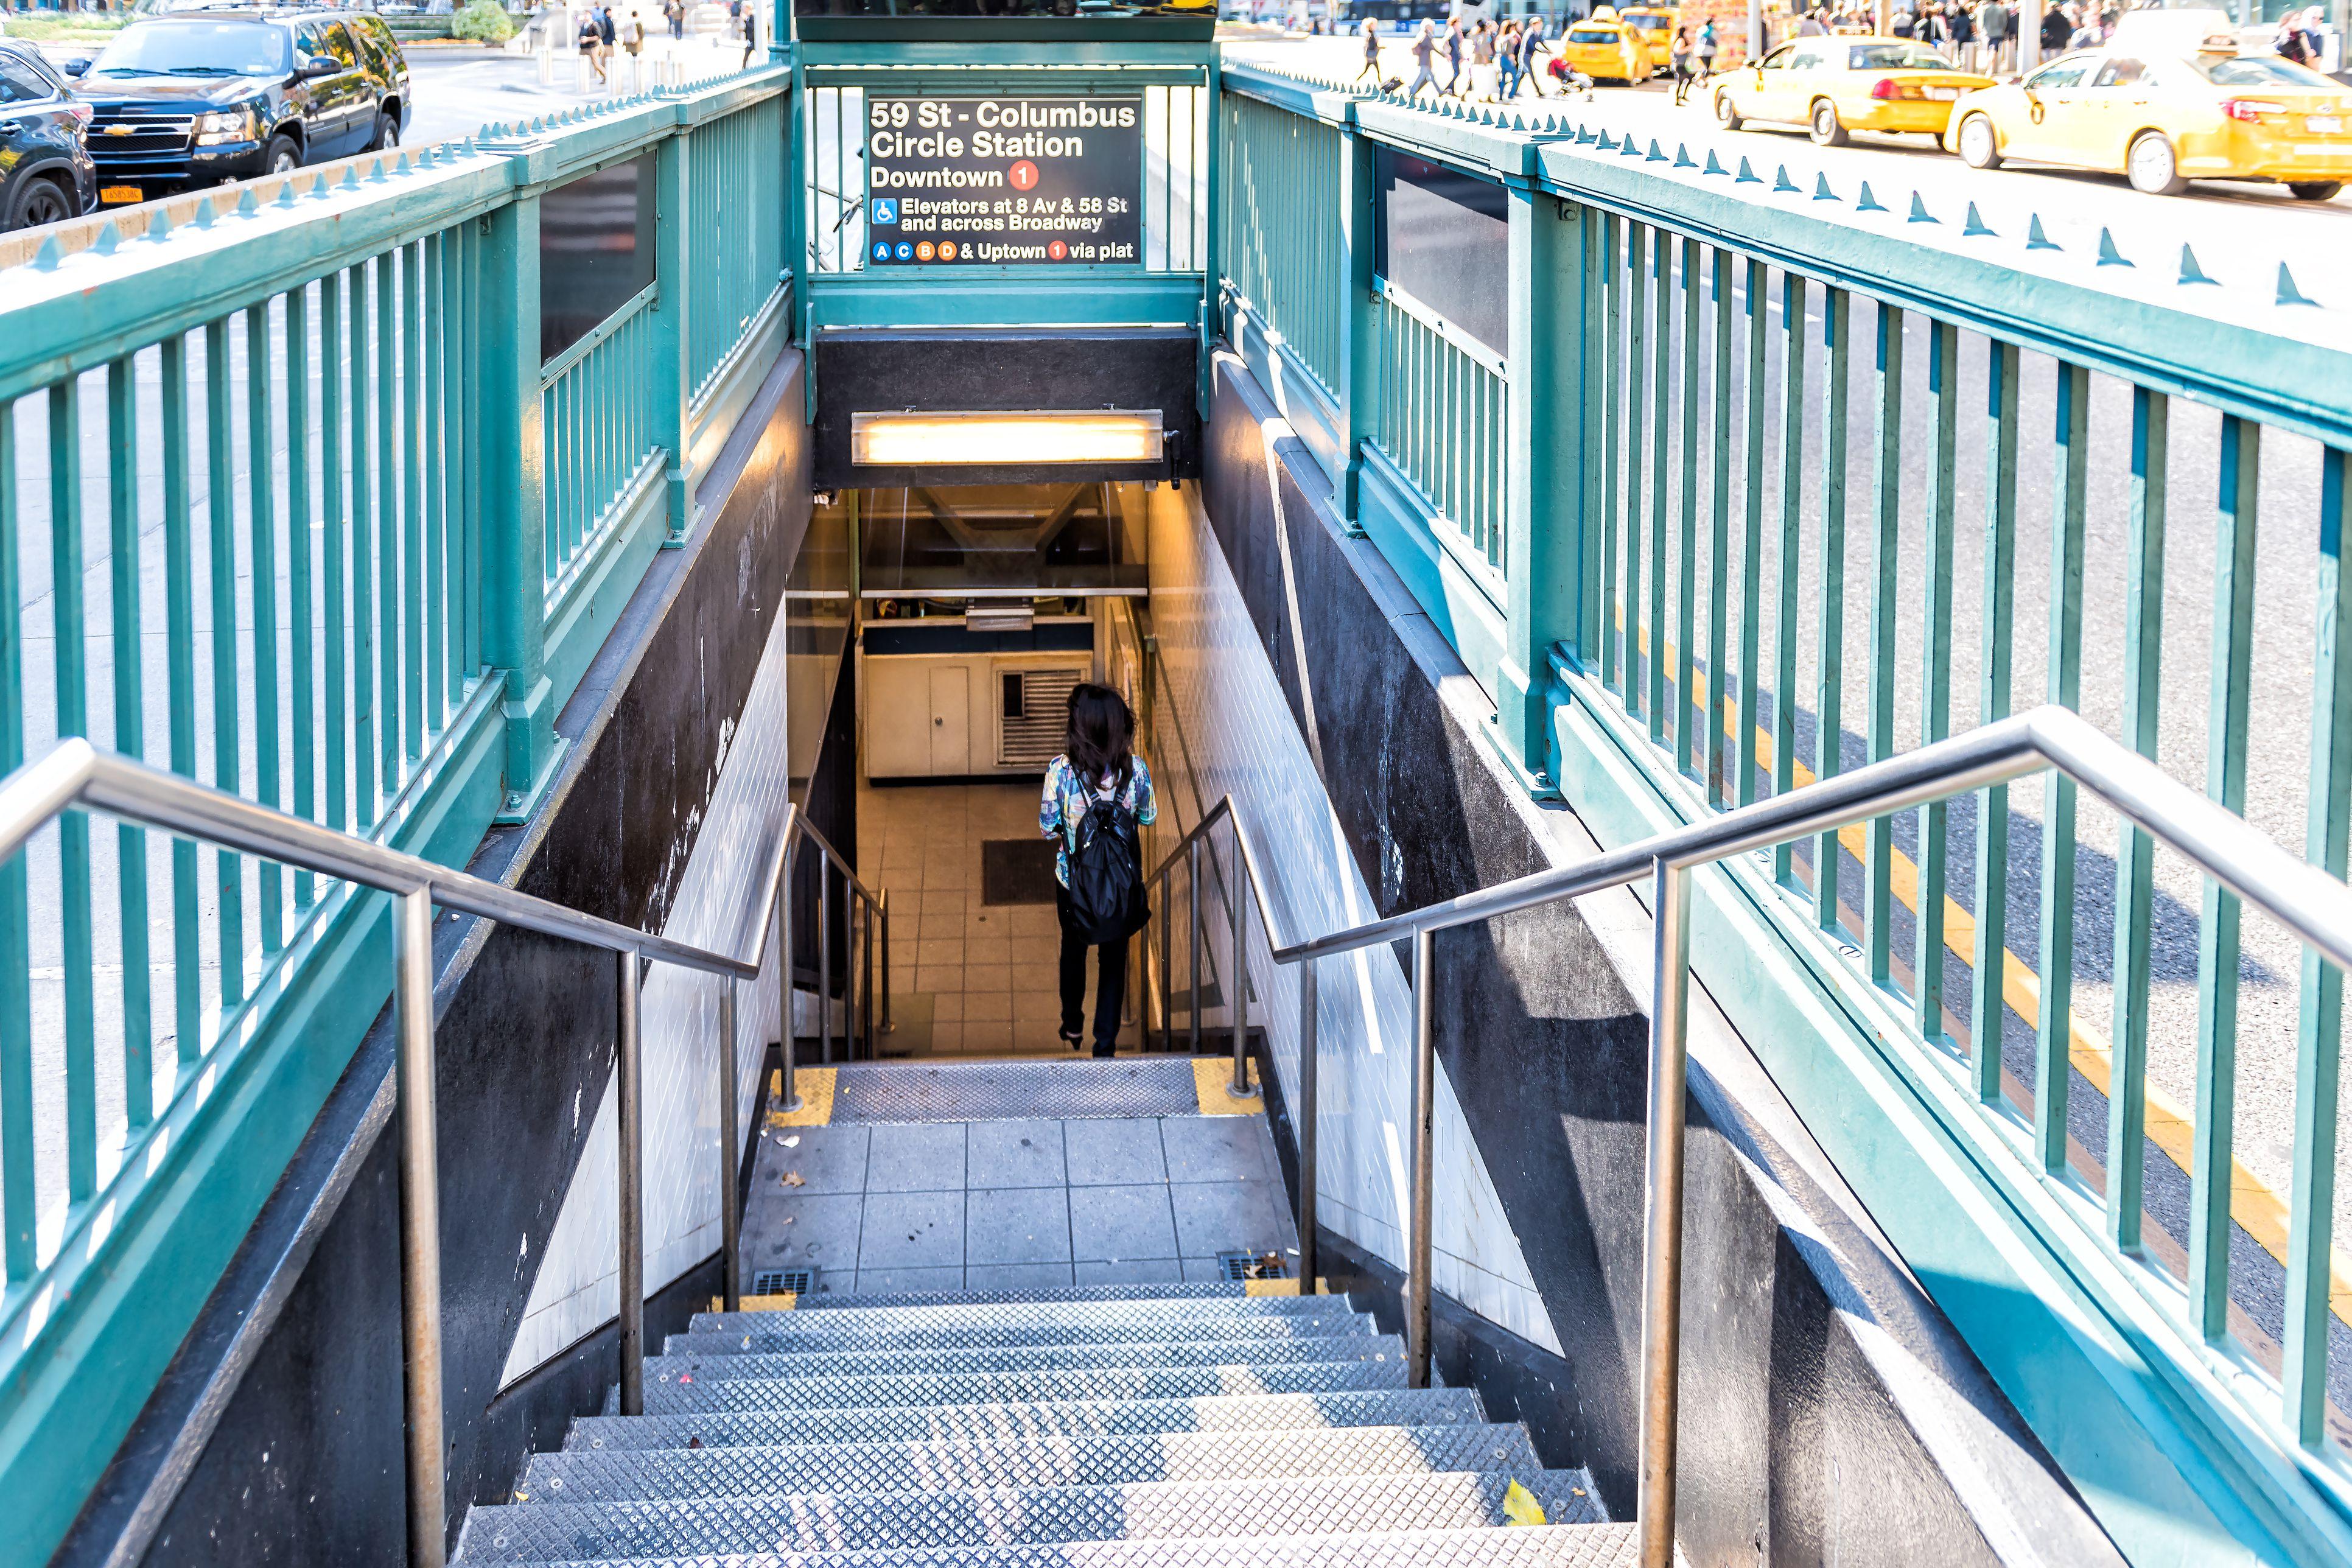 Columbus Circle Subway Map.Understanding New York City Subways And Buses